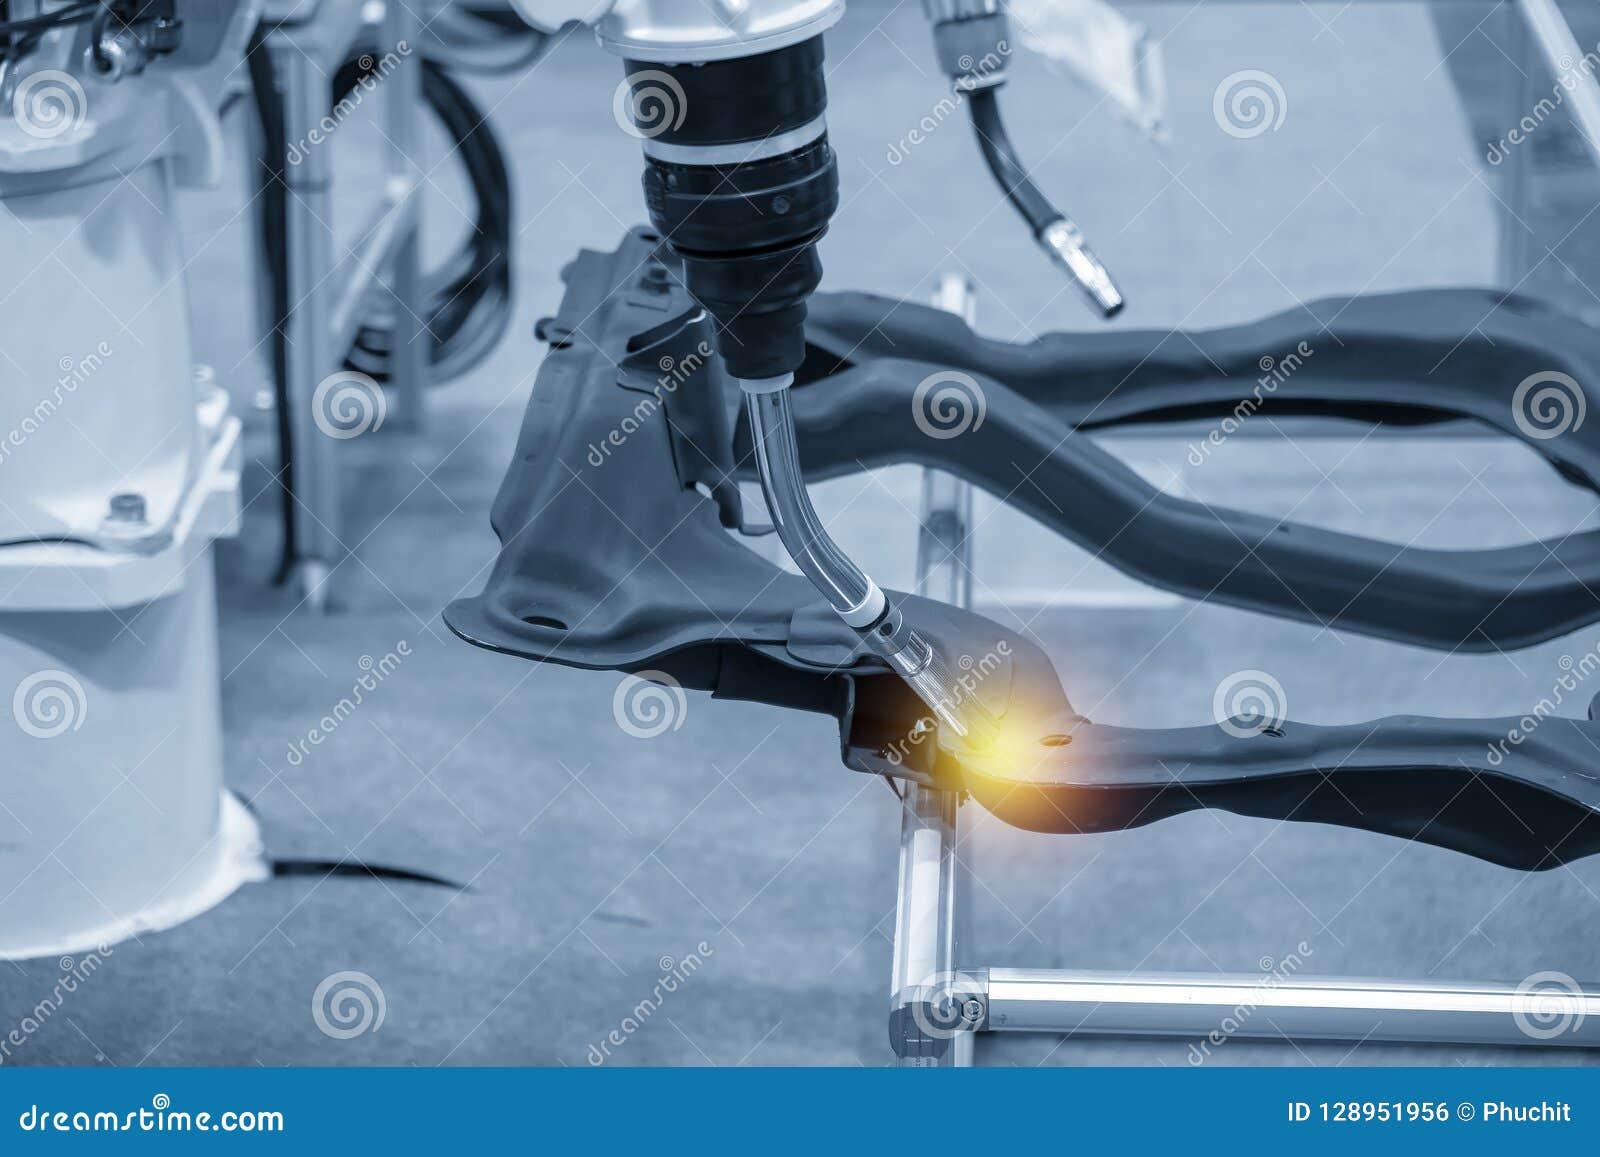 The welding robot machine for welding automotive part.